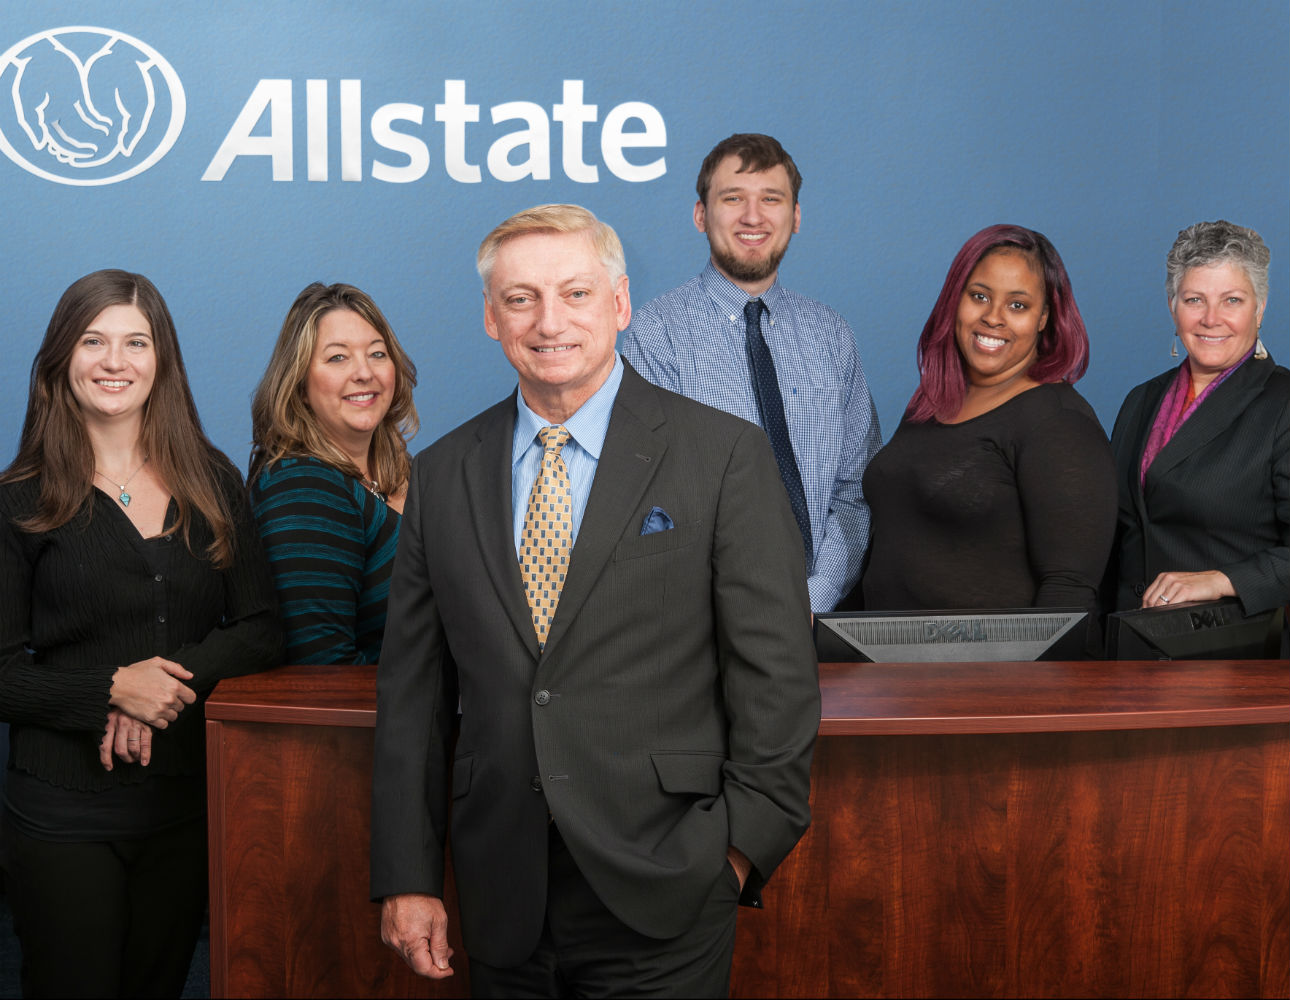 Benson Insurance & Financial Services: Allstate Insurance image 1